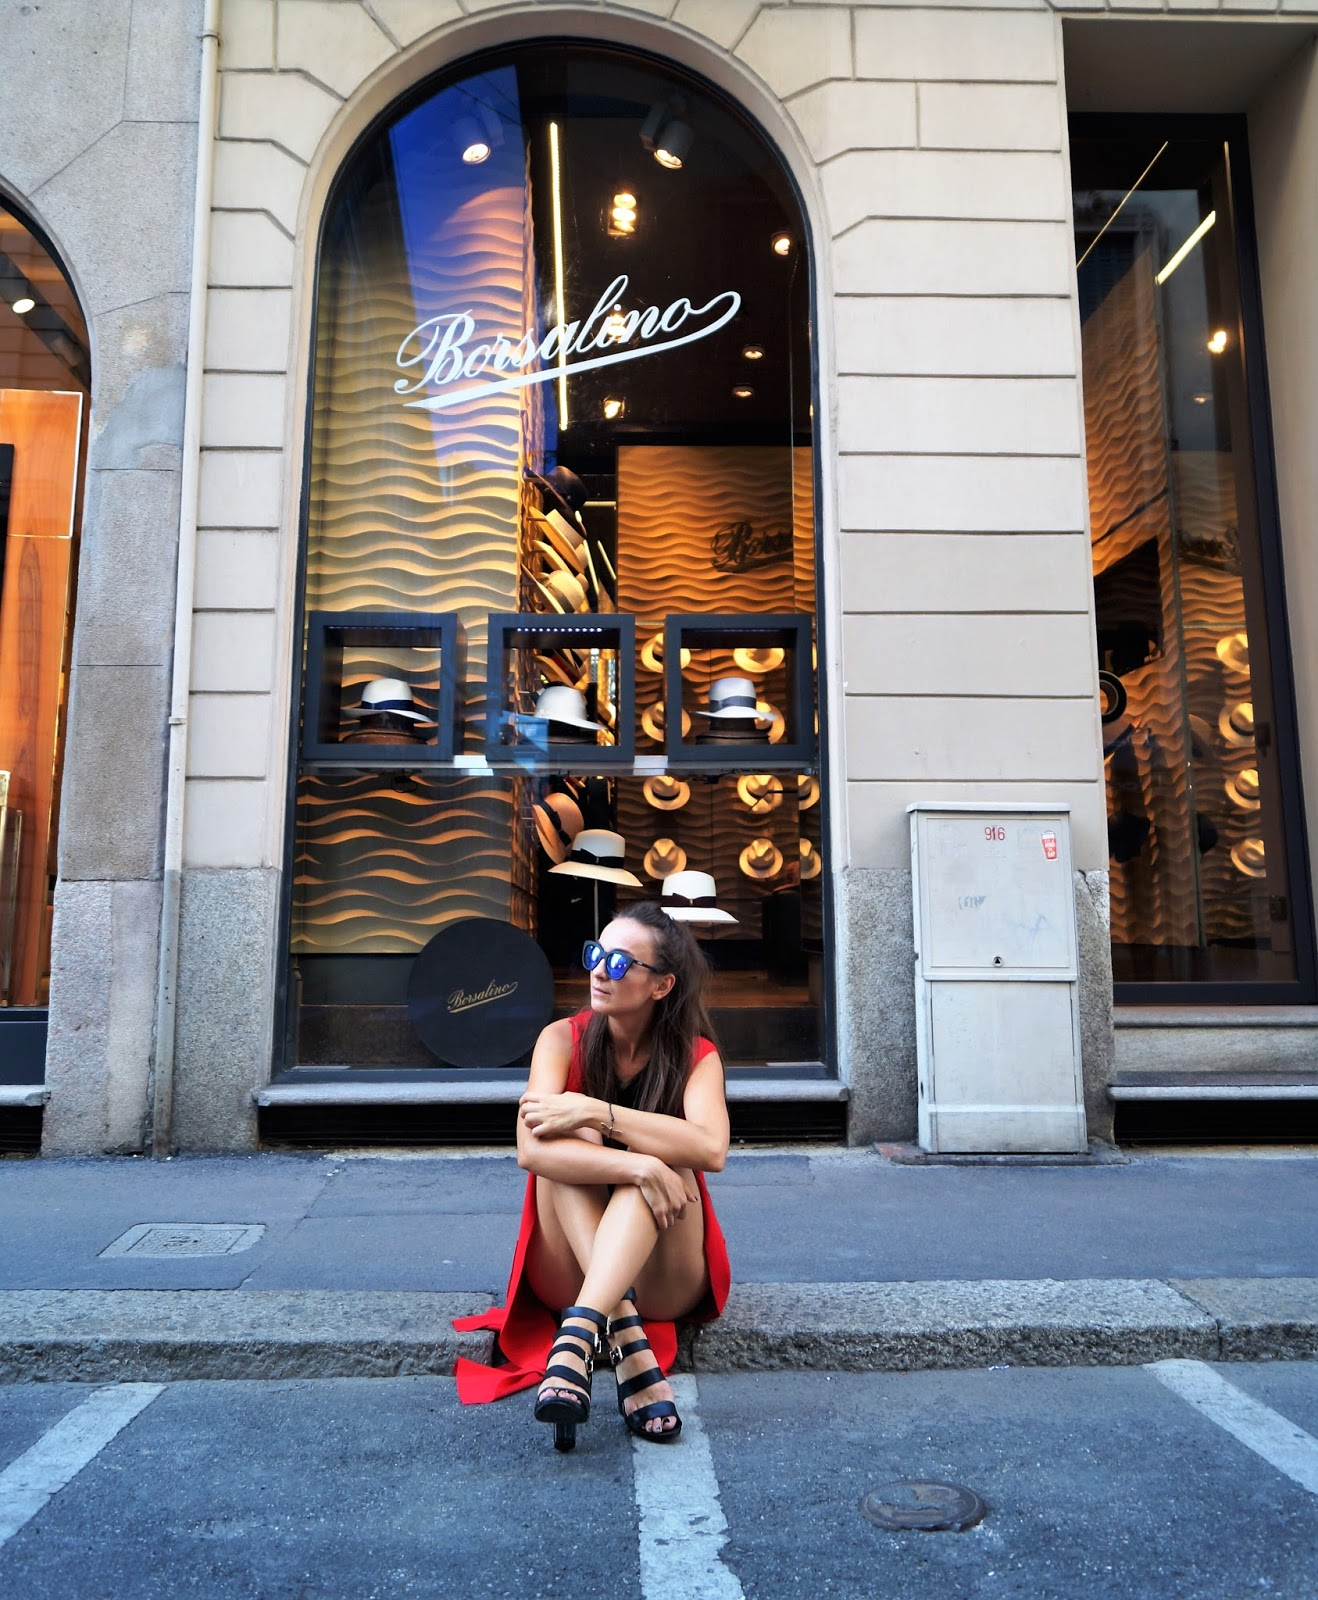 Modowa Mapa Mediolanu/ Milan Fashion Map: Via della Spiga